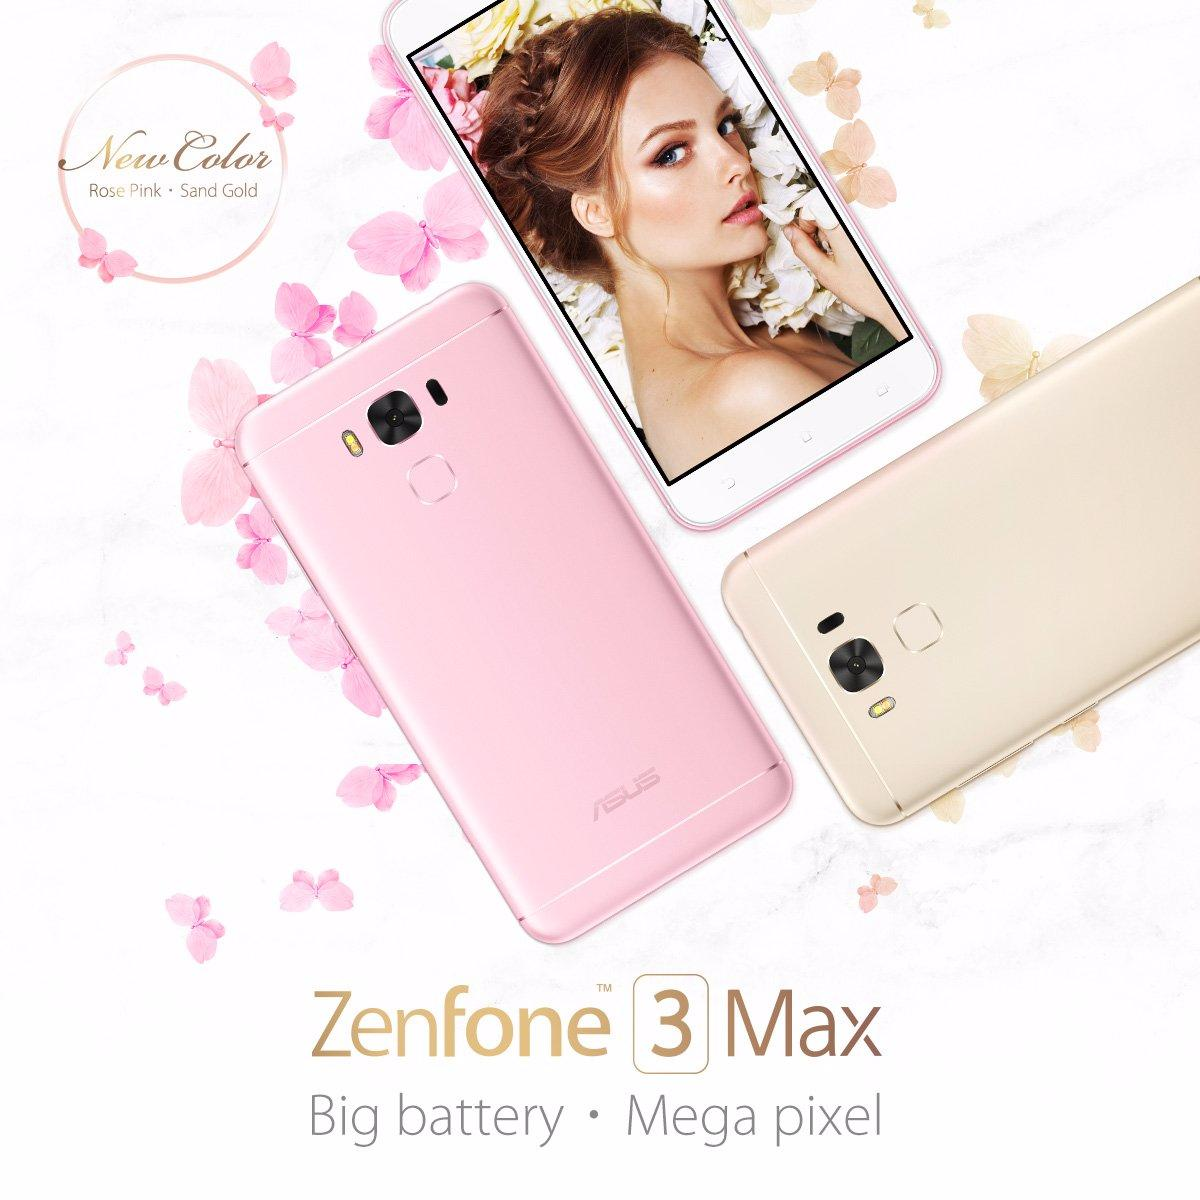 ASUS ZenFone 3 Max 5.5 (ZC553KL) 3GB Ram / 32GB – Local Set 1 Year Asus Warranty